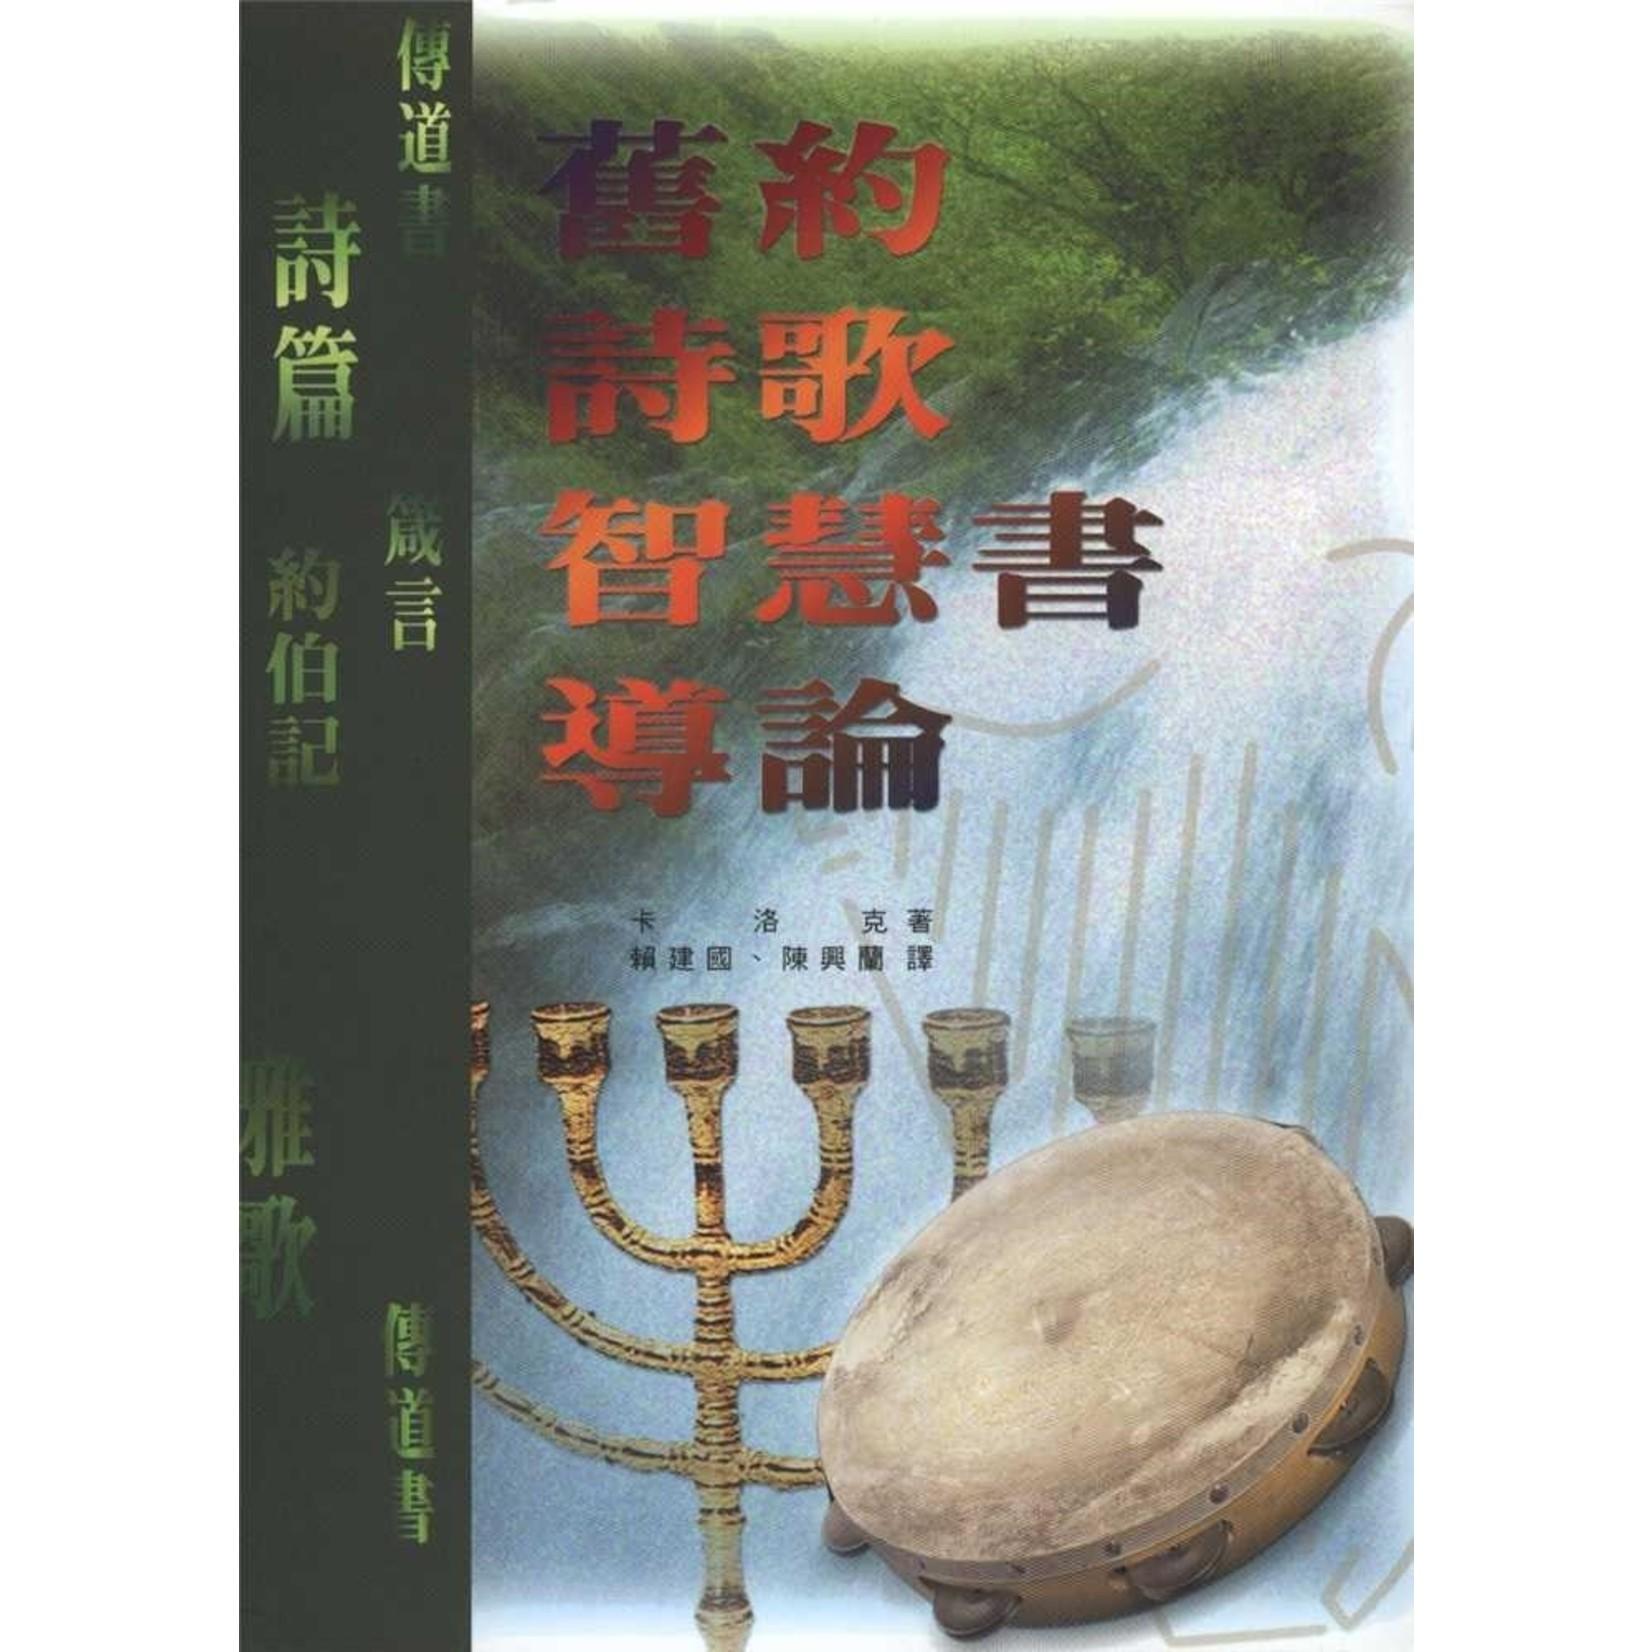 中華福音神學院 China Evangelical Seminary 舊約詩歌智慧書導論 Introduction to the Old Testament Poetic Books